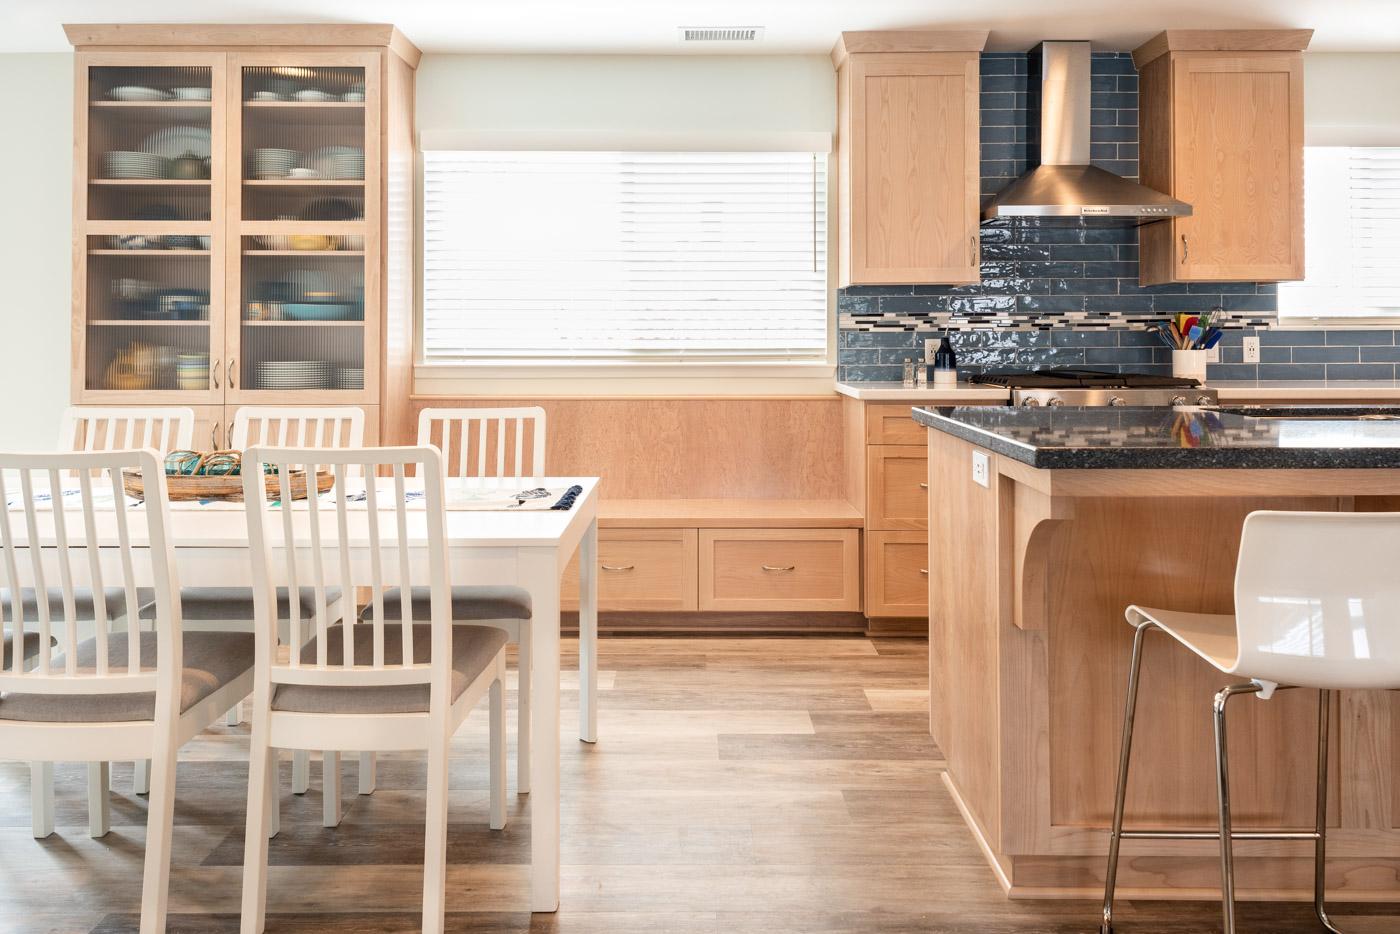 Sligh Cabinets Custom Kitchen Design Morro Bay-13.jpg